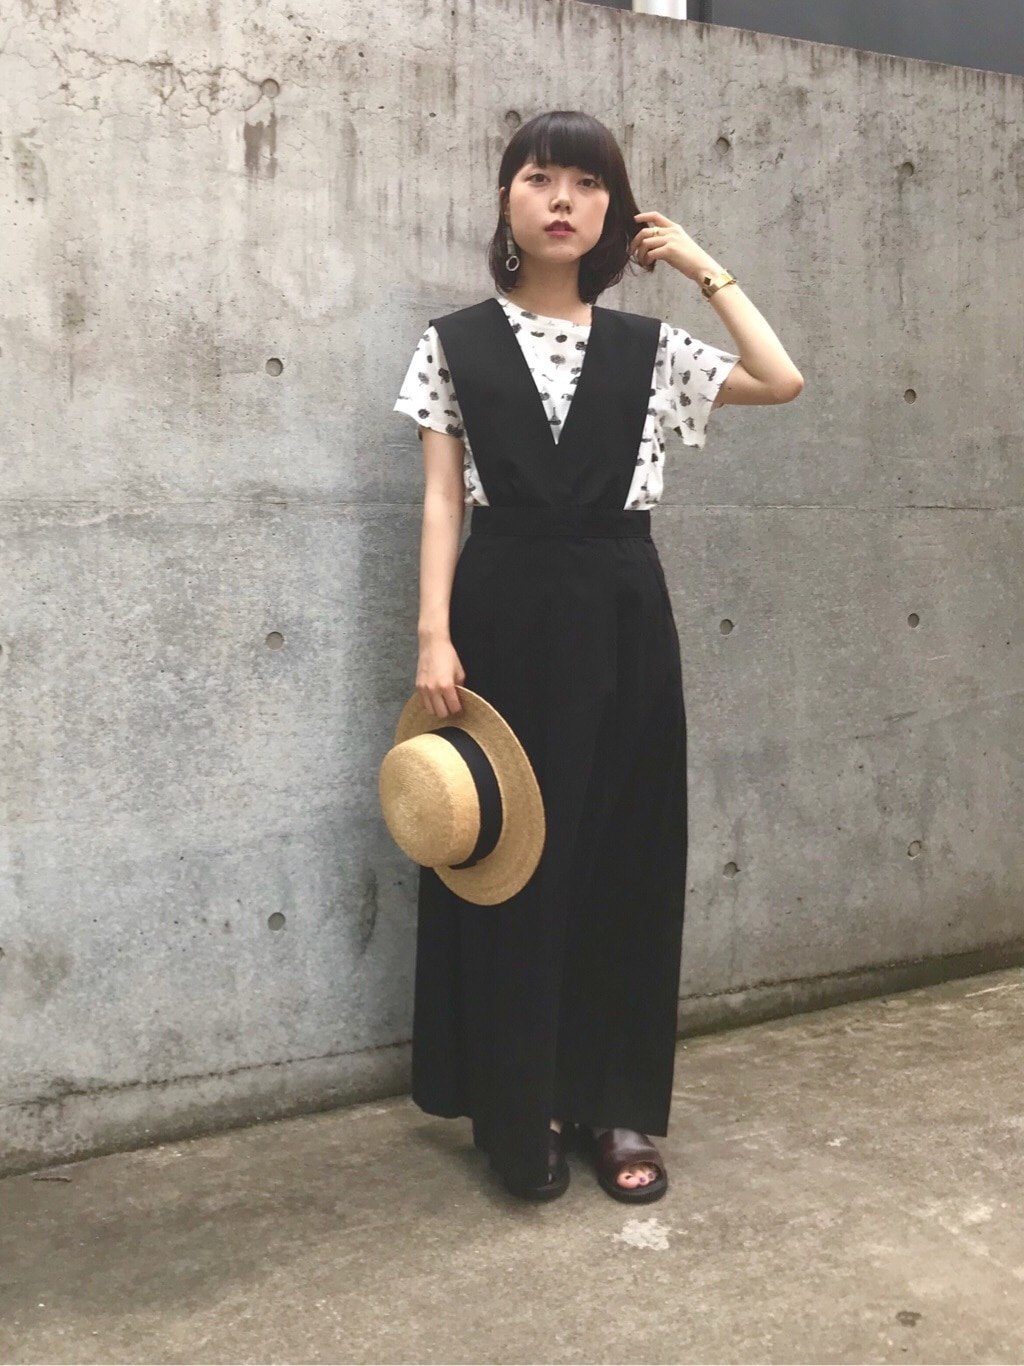 bulle de savon 中目黒路面 身長:153cm 2019.07.25